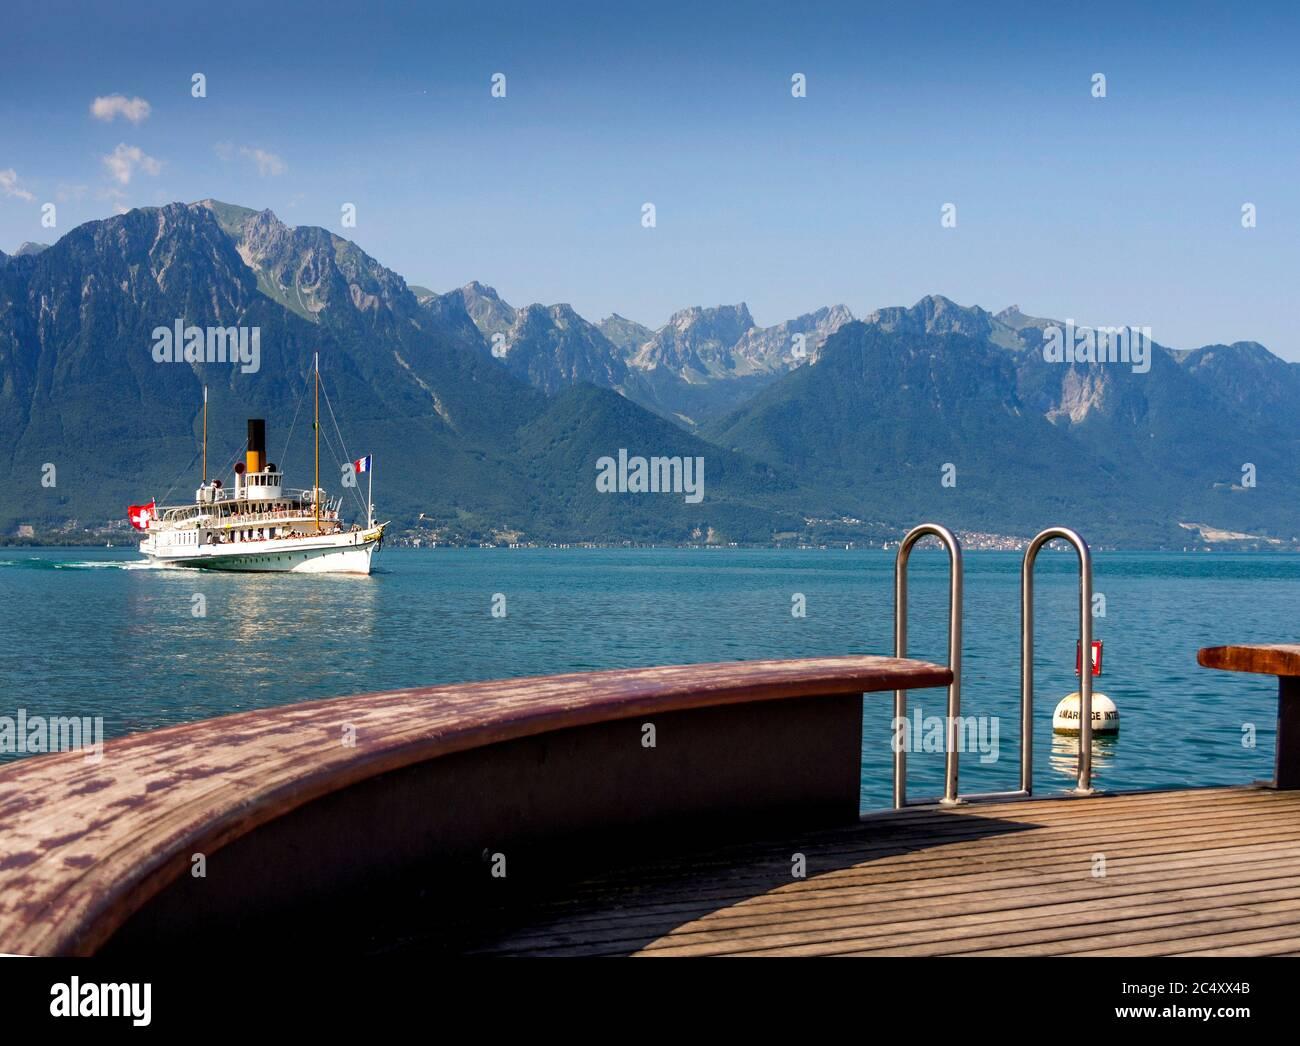 Ferry boat on Lake Leman near Montreux, Canton Vaud, Switzerland Stock Photo